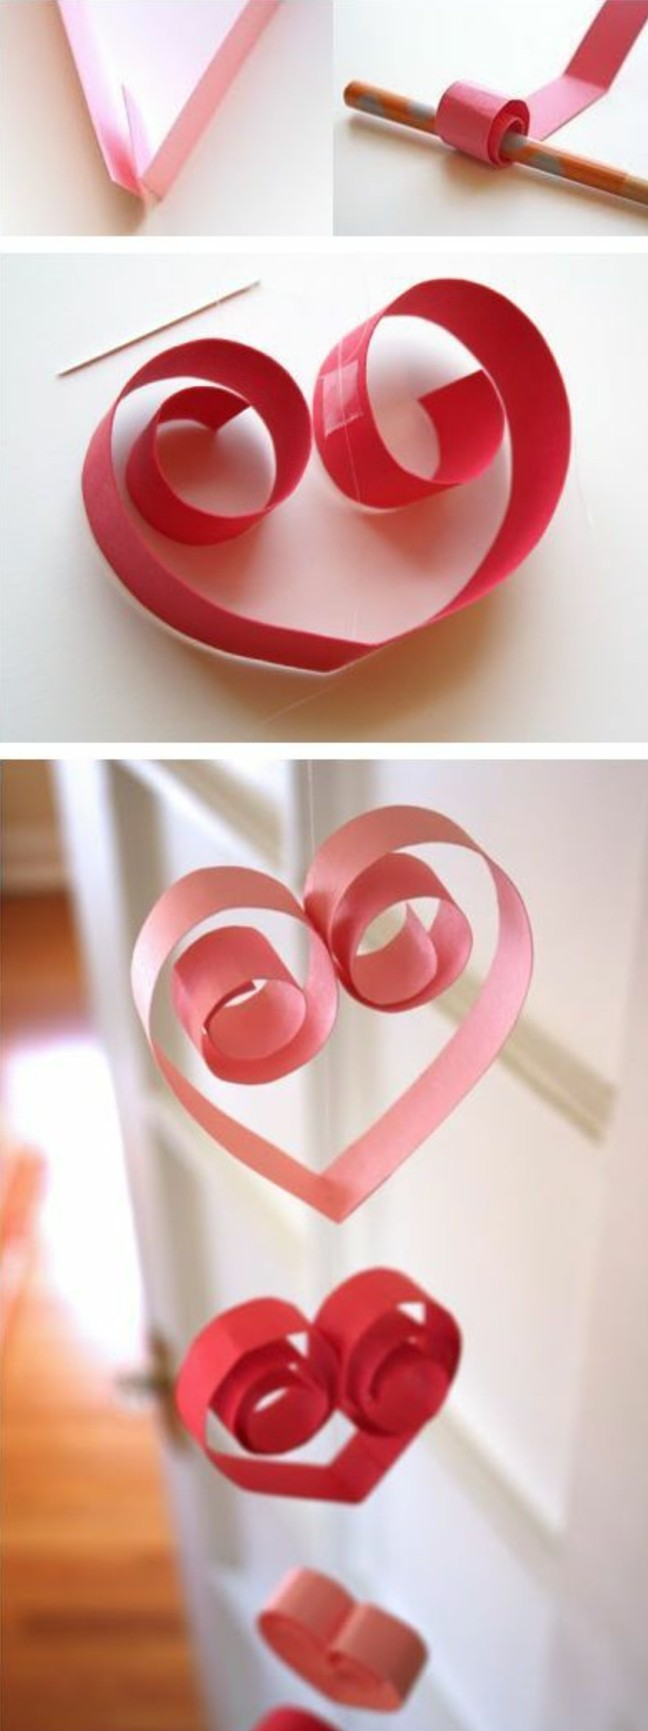 idee-interessante-de-guirlande-diy-pour-saint-valentin-de-petites-coeurs-enfiles